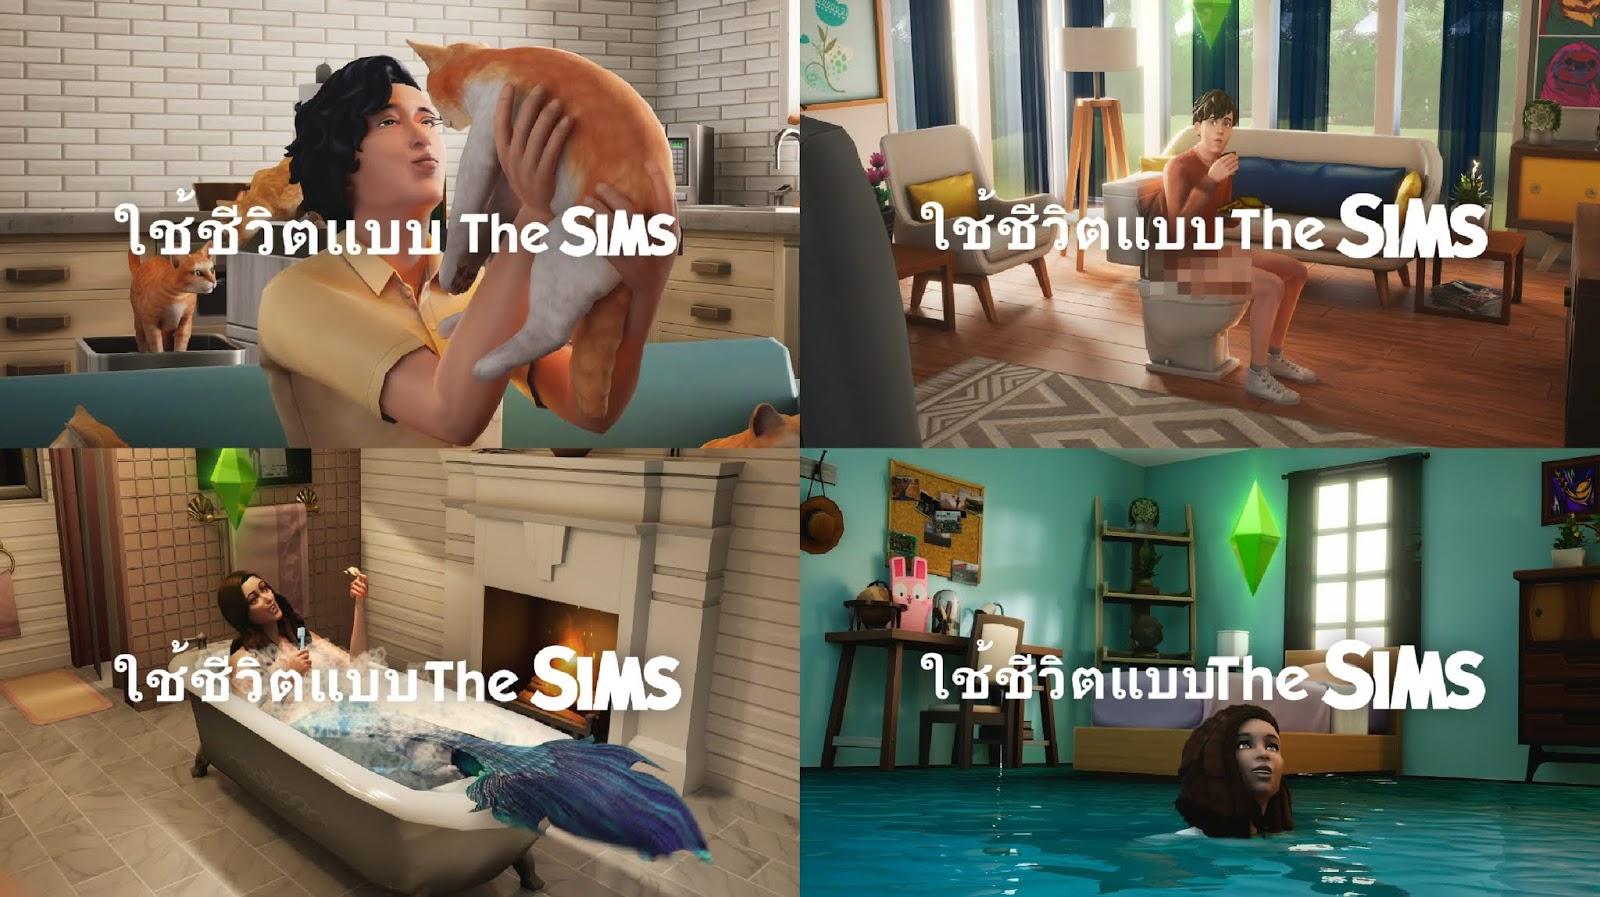 The Sims 4 เปิดตัวแคมเปญ Live The Sims Lifeพร้อม 4 วิดีโอซีรีส์ ชวนคุณมาฉลองปีใหม่ในรูปแบบแฟนตาซีไปอีกขั้น